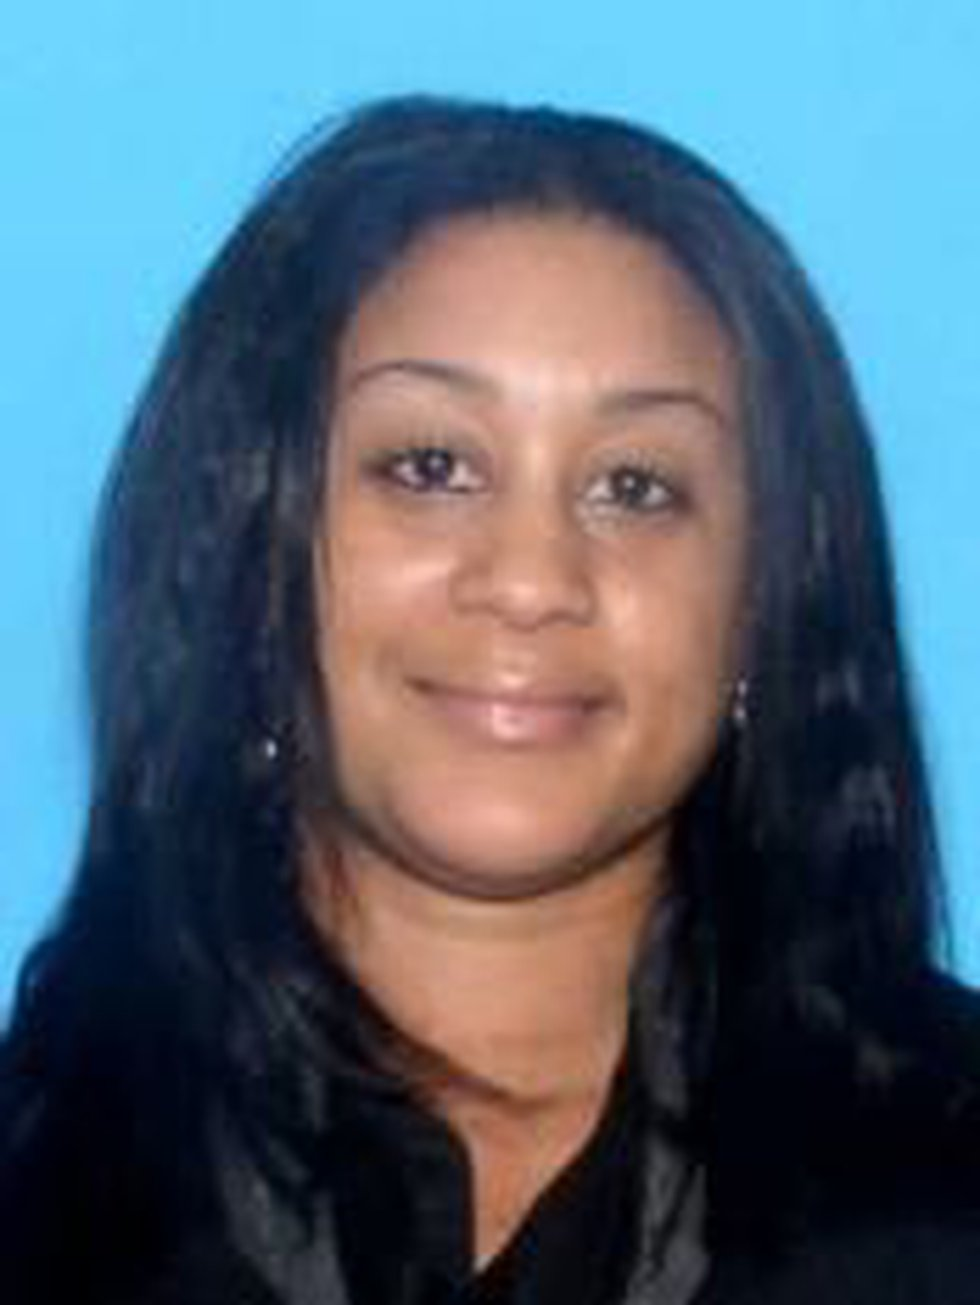 Fairfield police say victim Sherri Smith knew her assailant. Photo courtesy Fairfield PD.